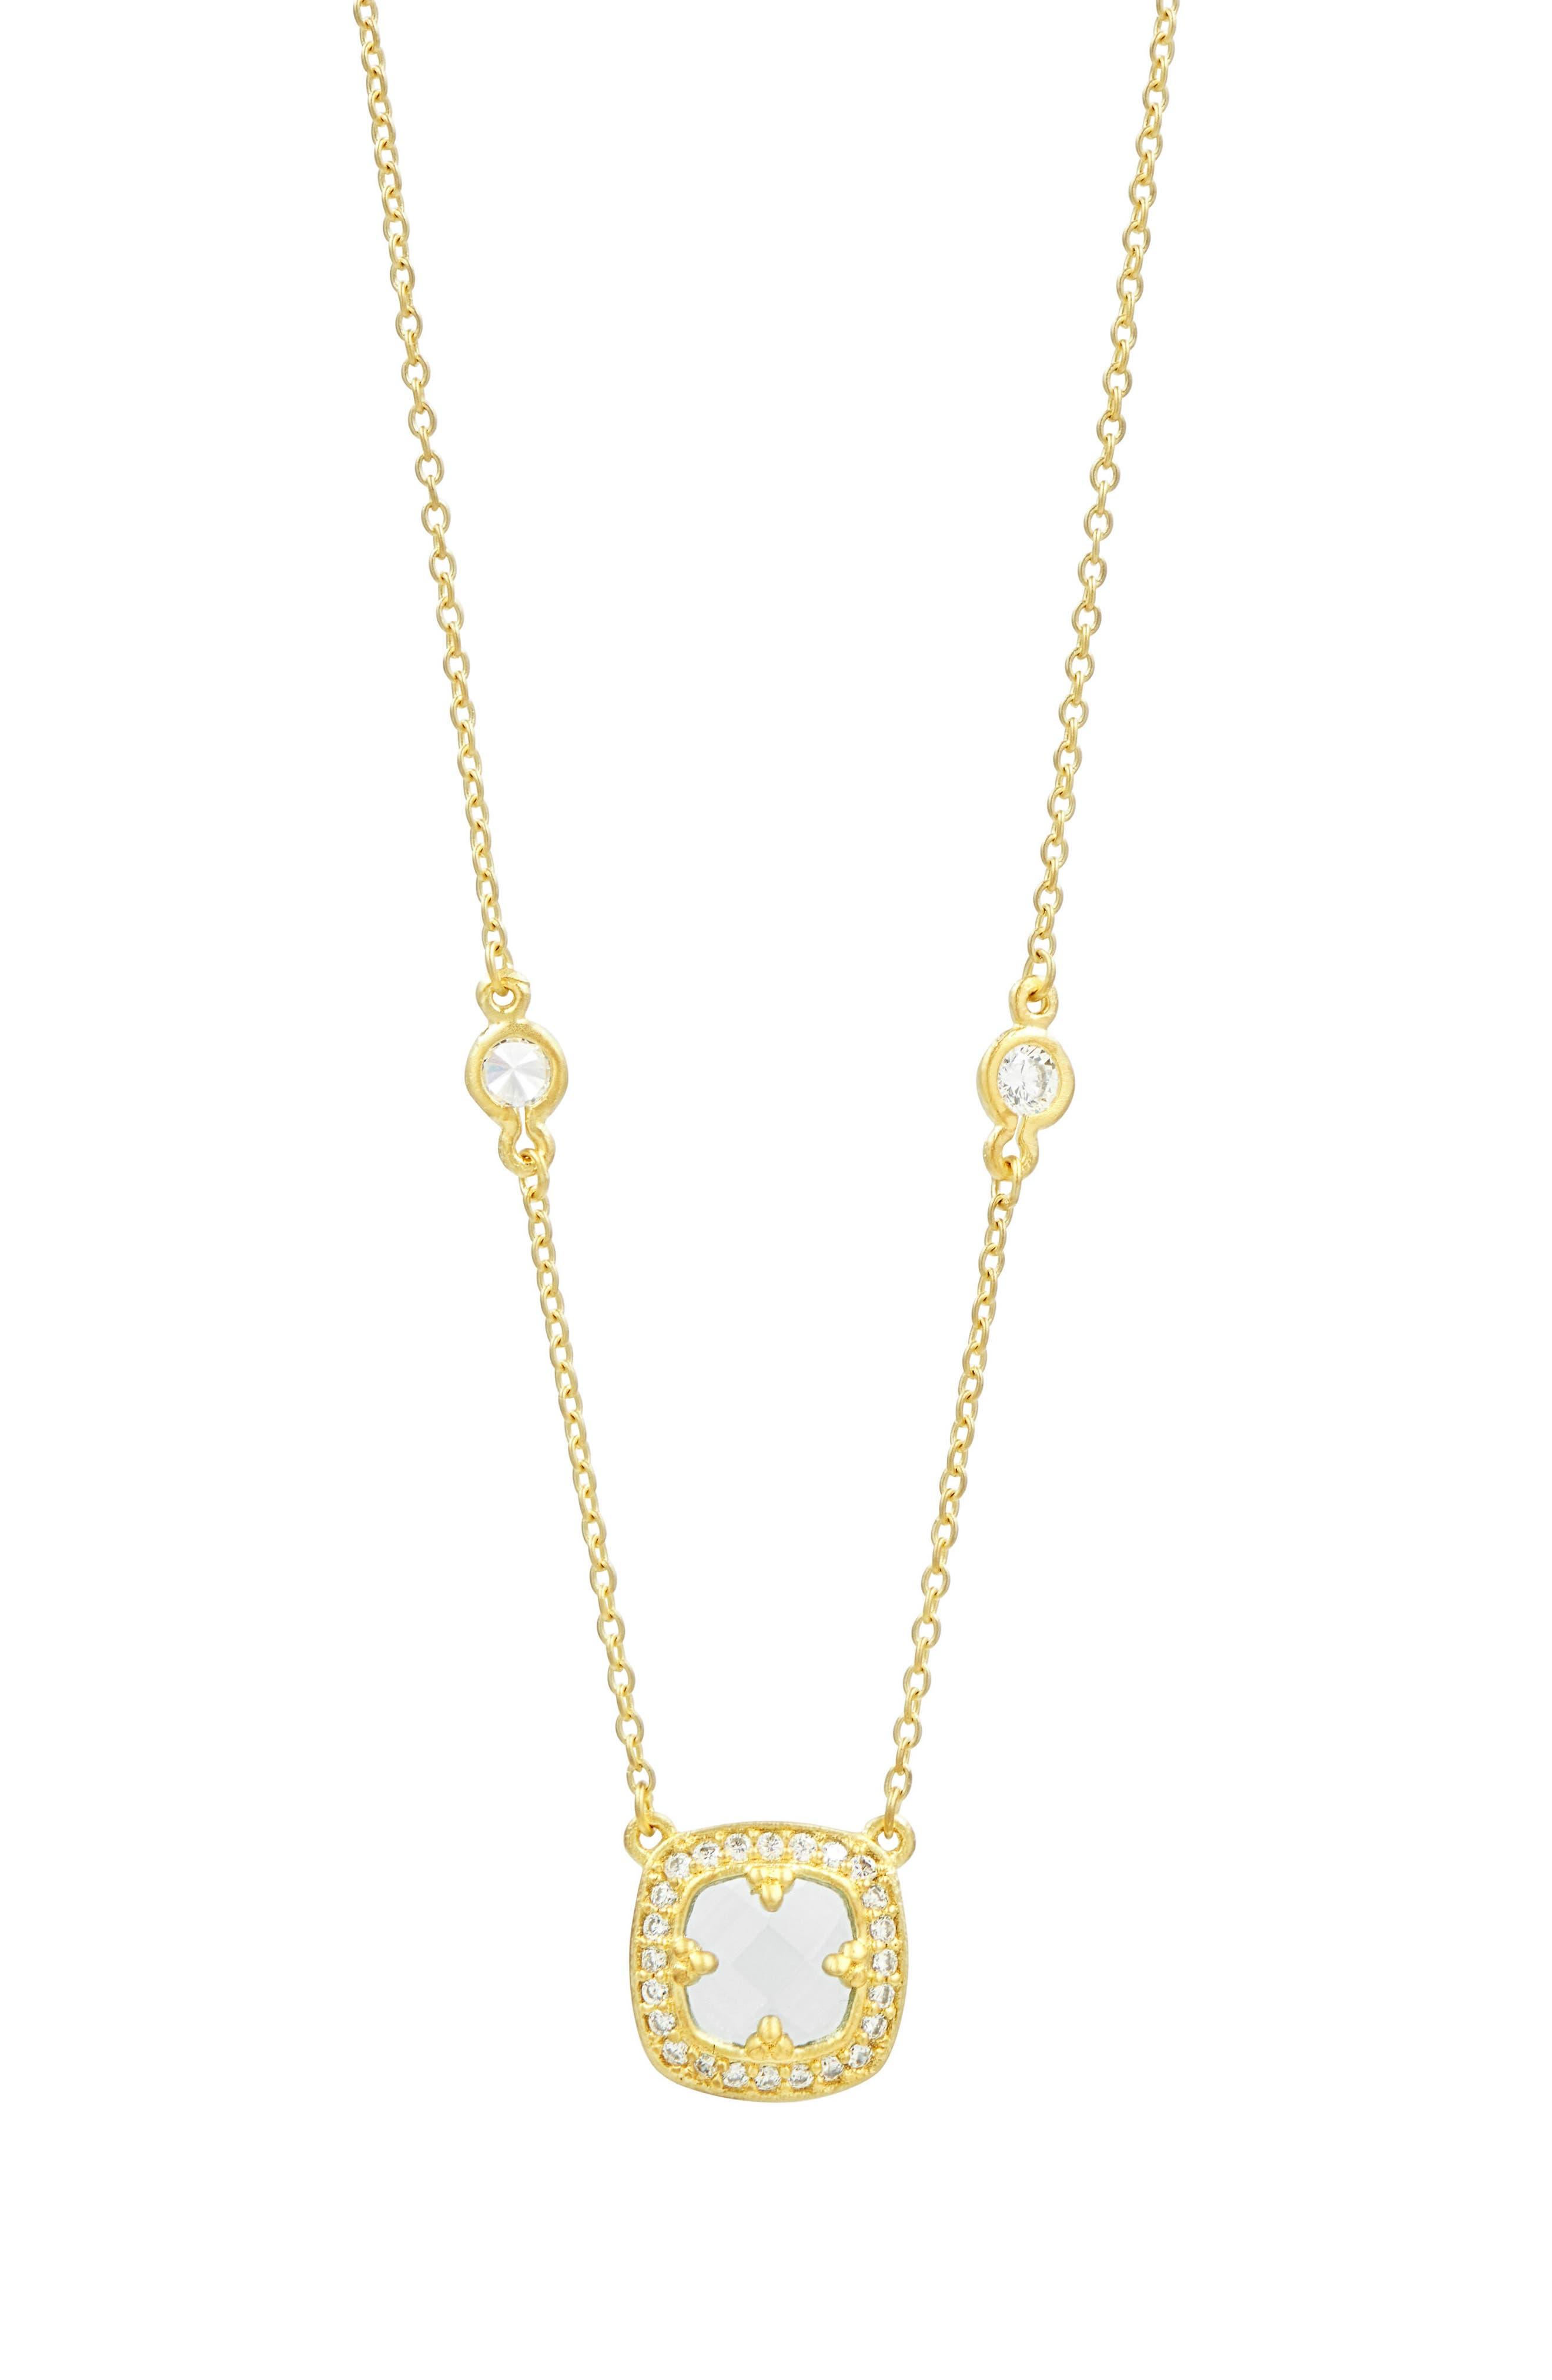 Ocean Azure Cubic Zirconia Pendant Necklace,                         Main,                         color, Gold/ Aqua